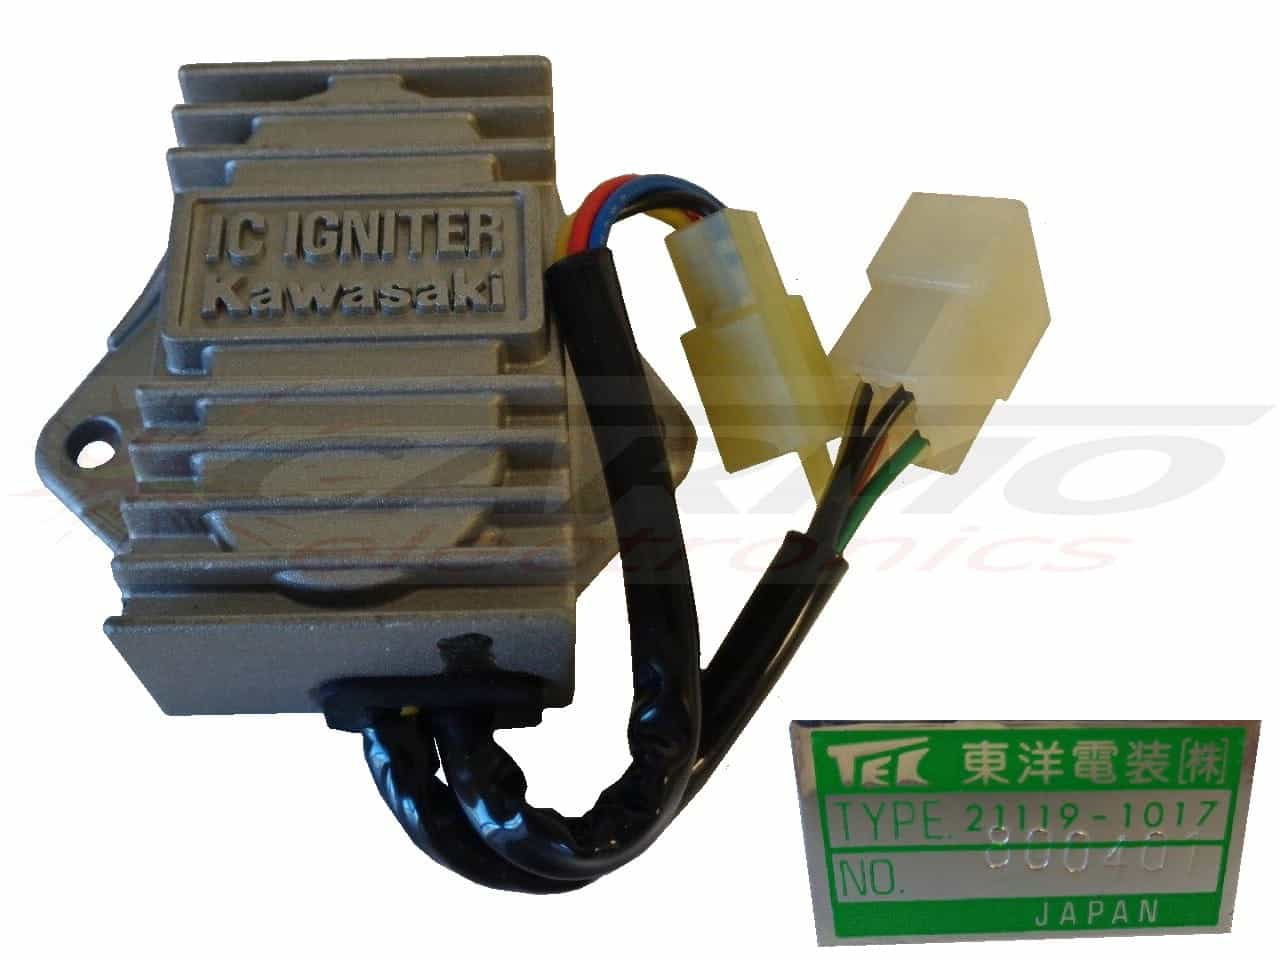 Kawasaki Carmo Electronics The Place For Parts Or 80 Kz650 Wiring Diagram 454 Ltd 21119 1017 Cdi Zndbox